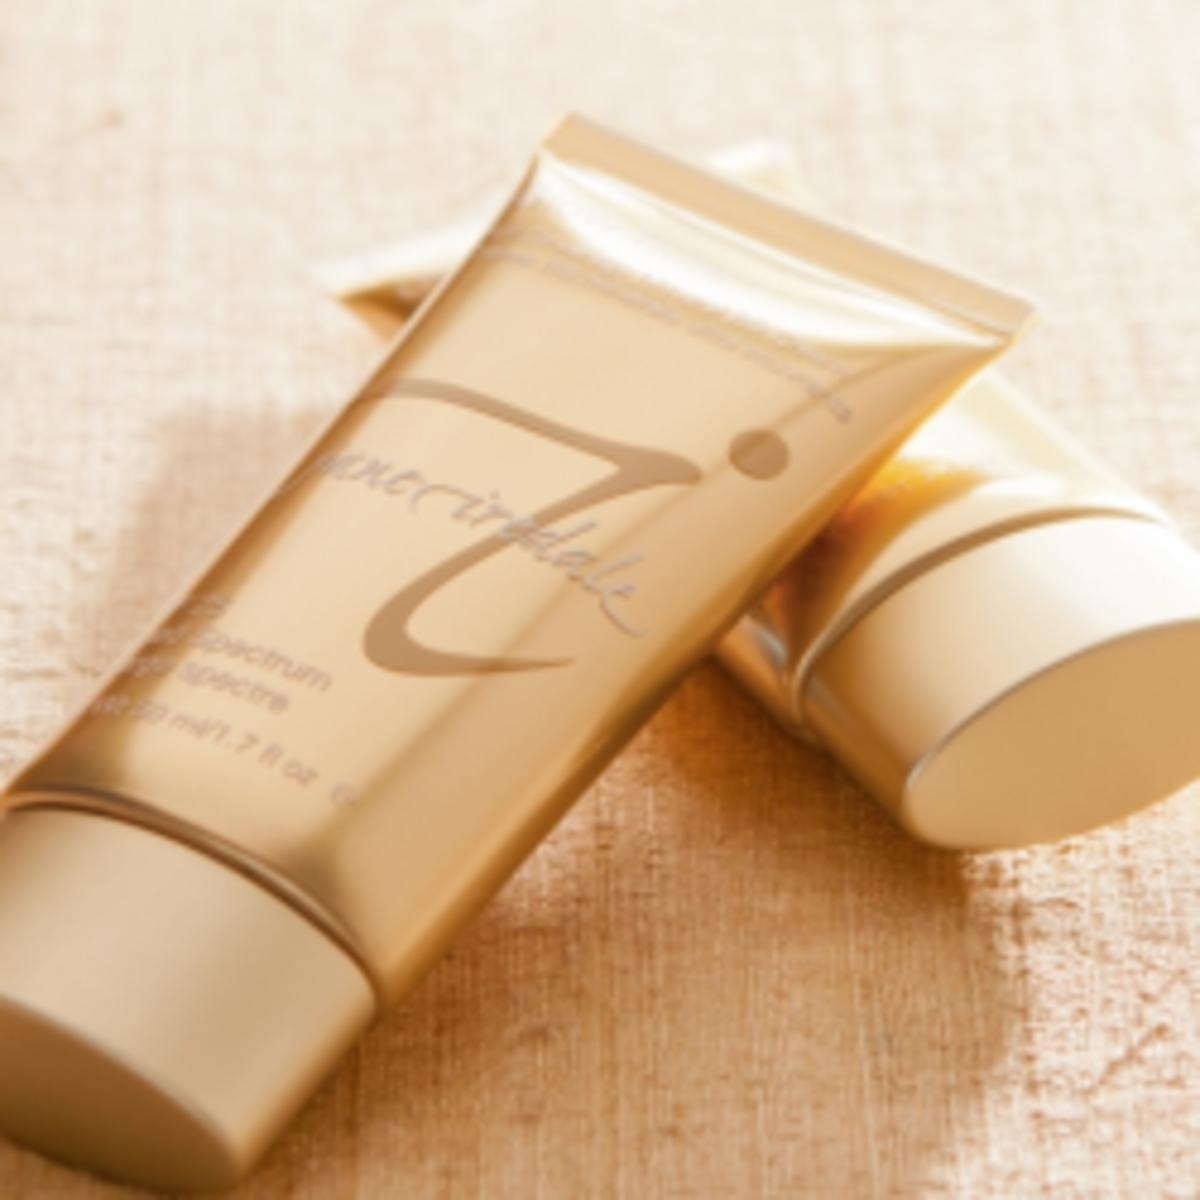 Best moisturizer for mature acne prone skin